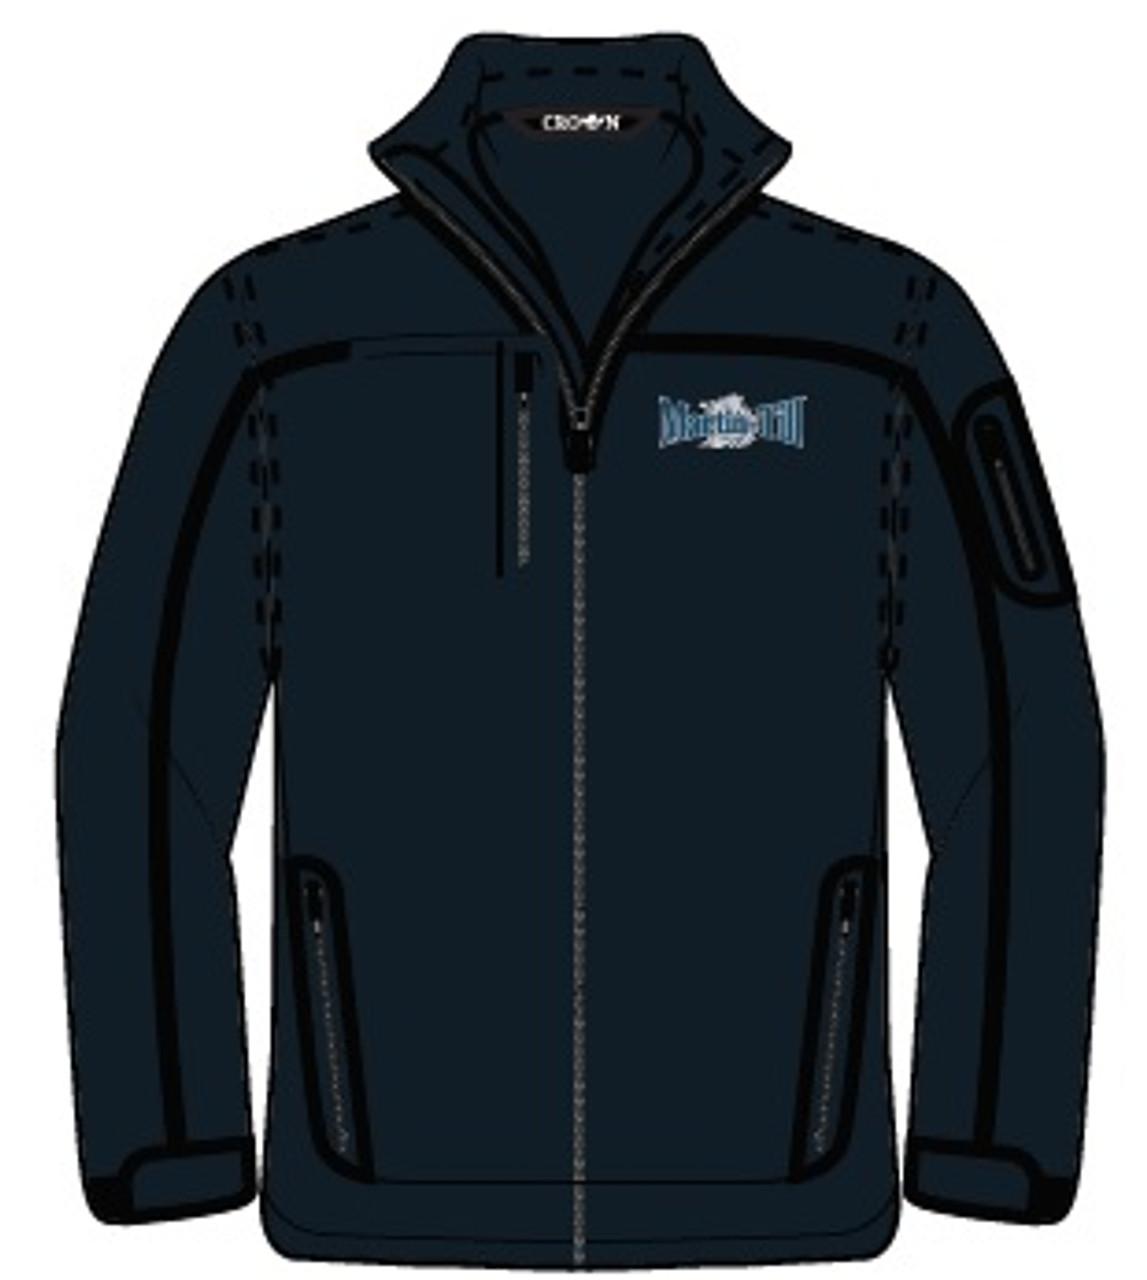 Black Diamond Soft Shell Jacket (TCP777)